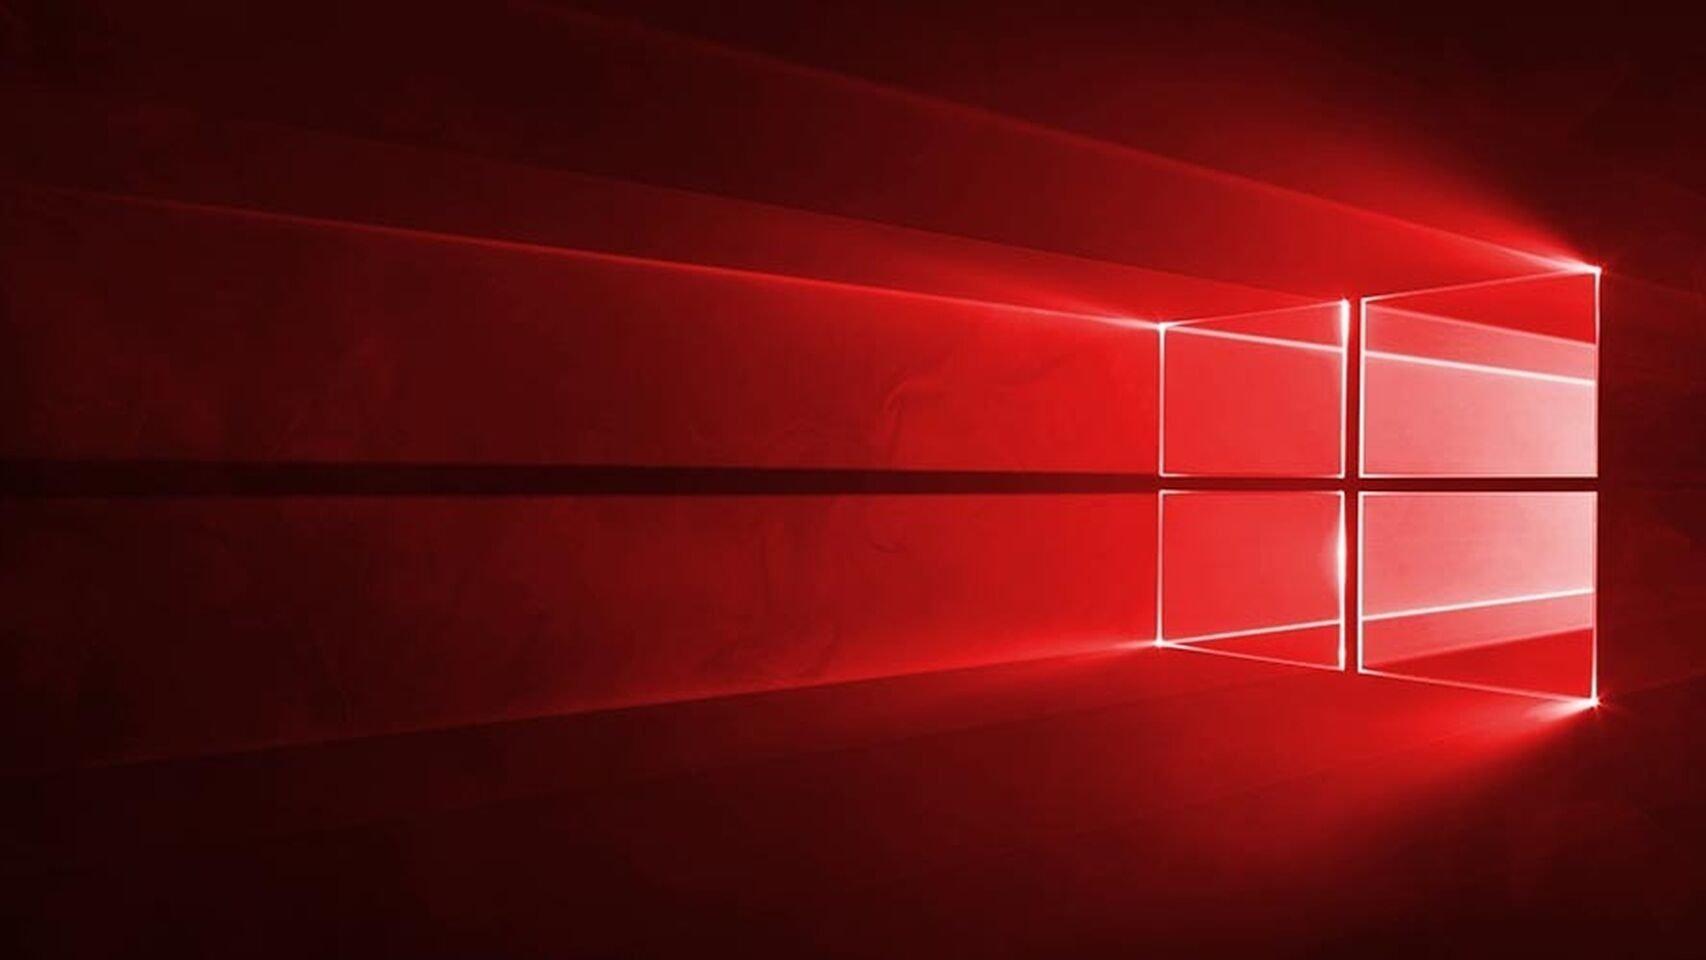 Microsoft windows 10 red